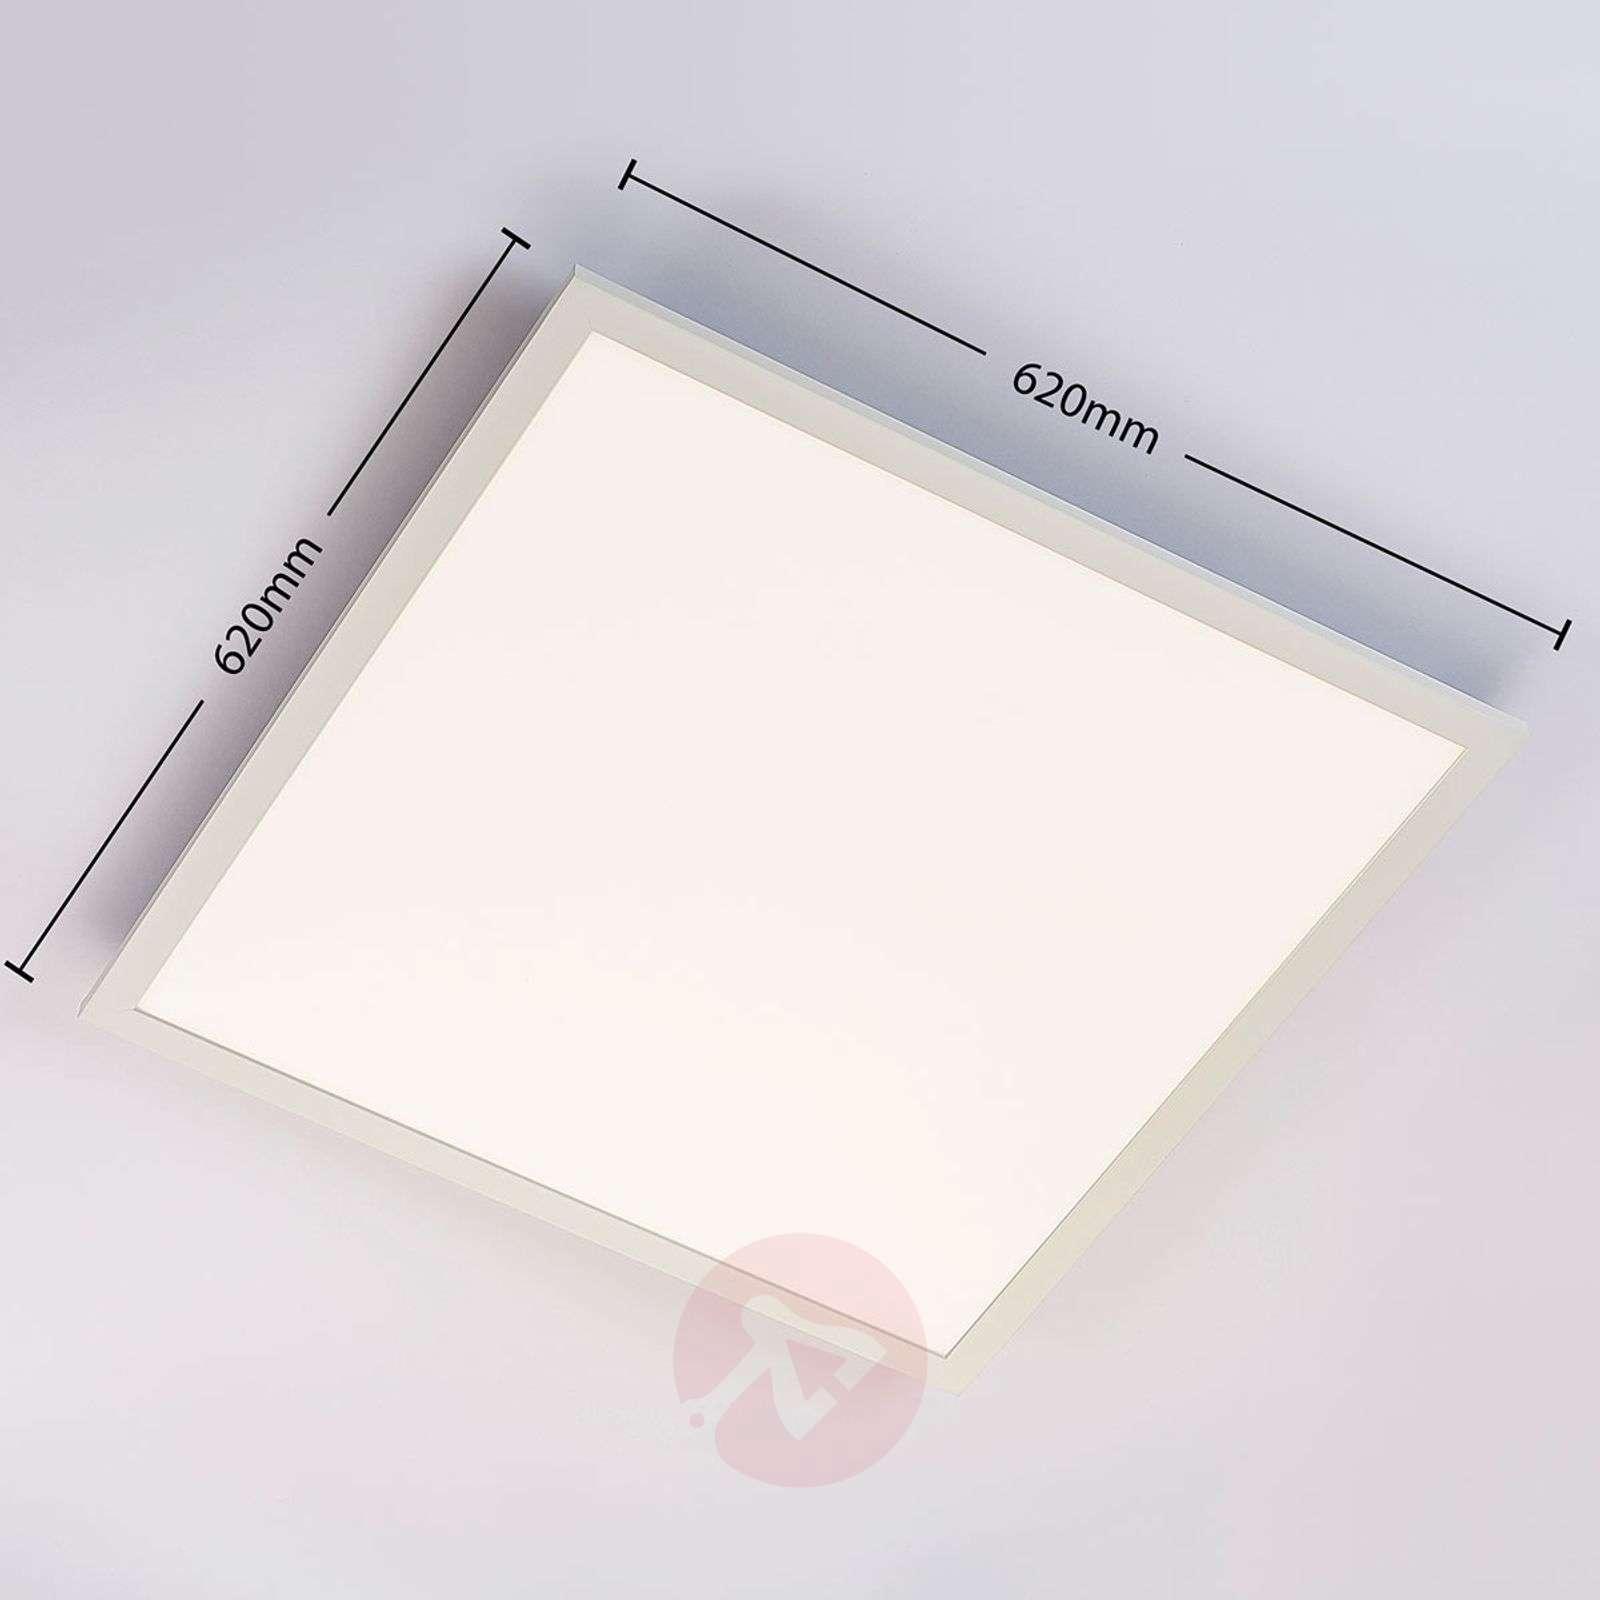 Tinus LED panel, colour change, RGB, warm white-9621653-04